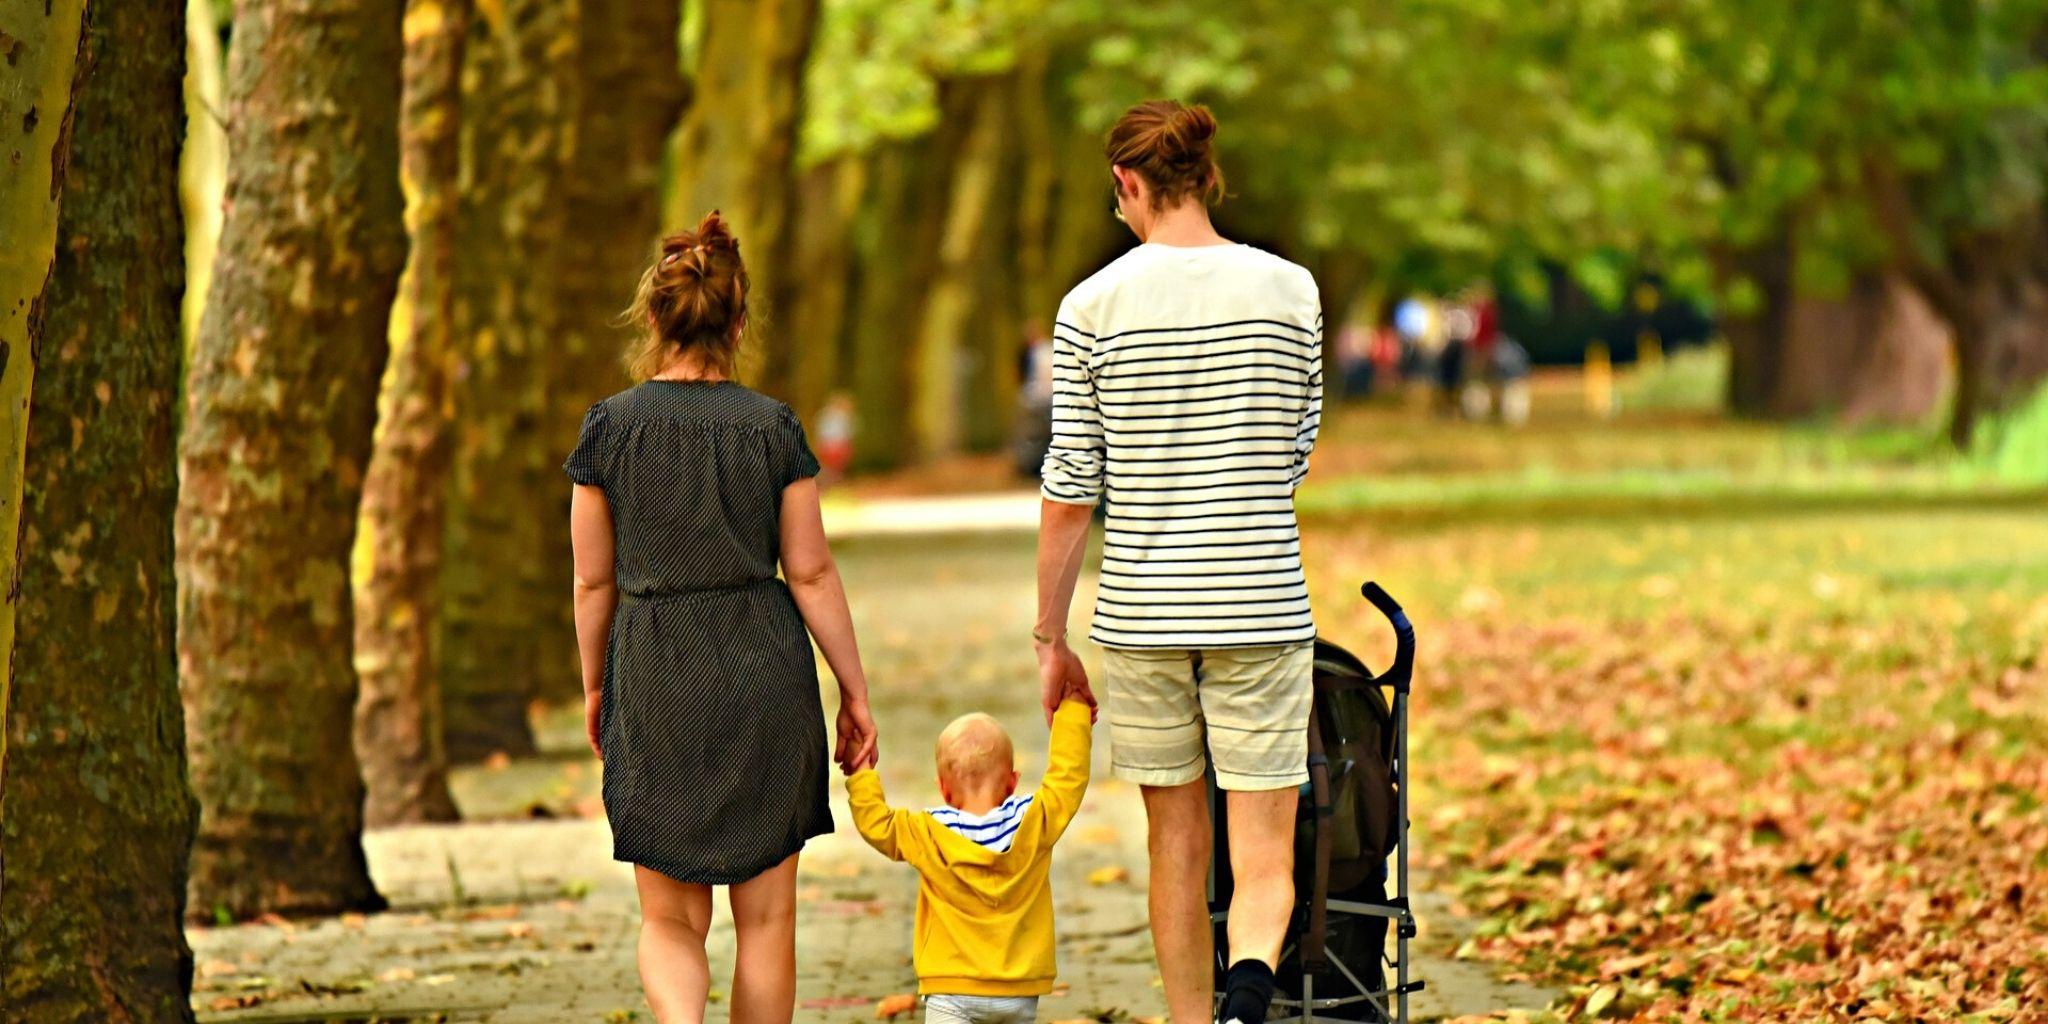 Vanhemmat-auttavat-vanhempia